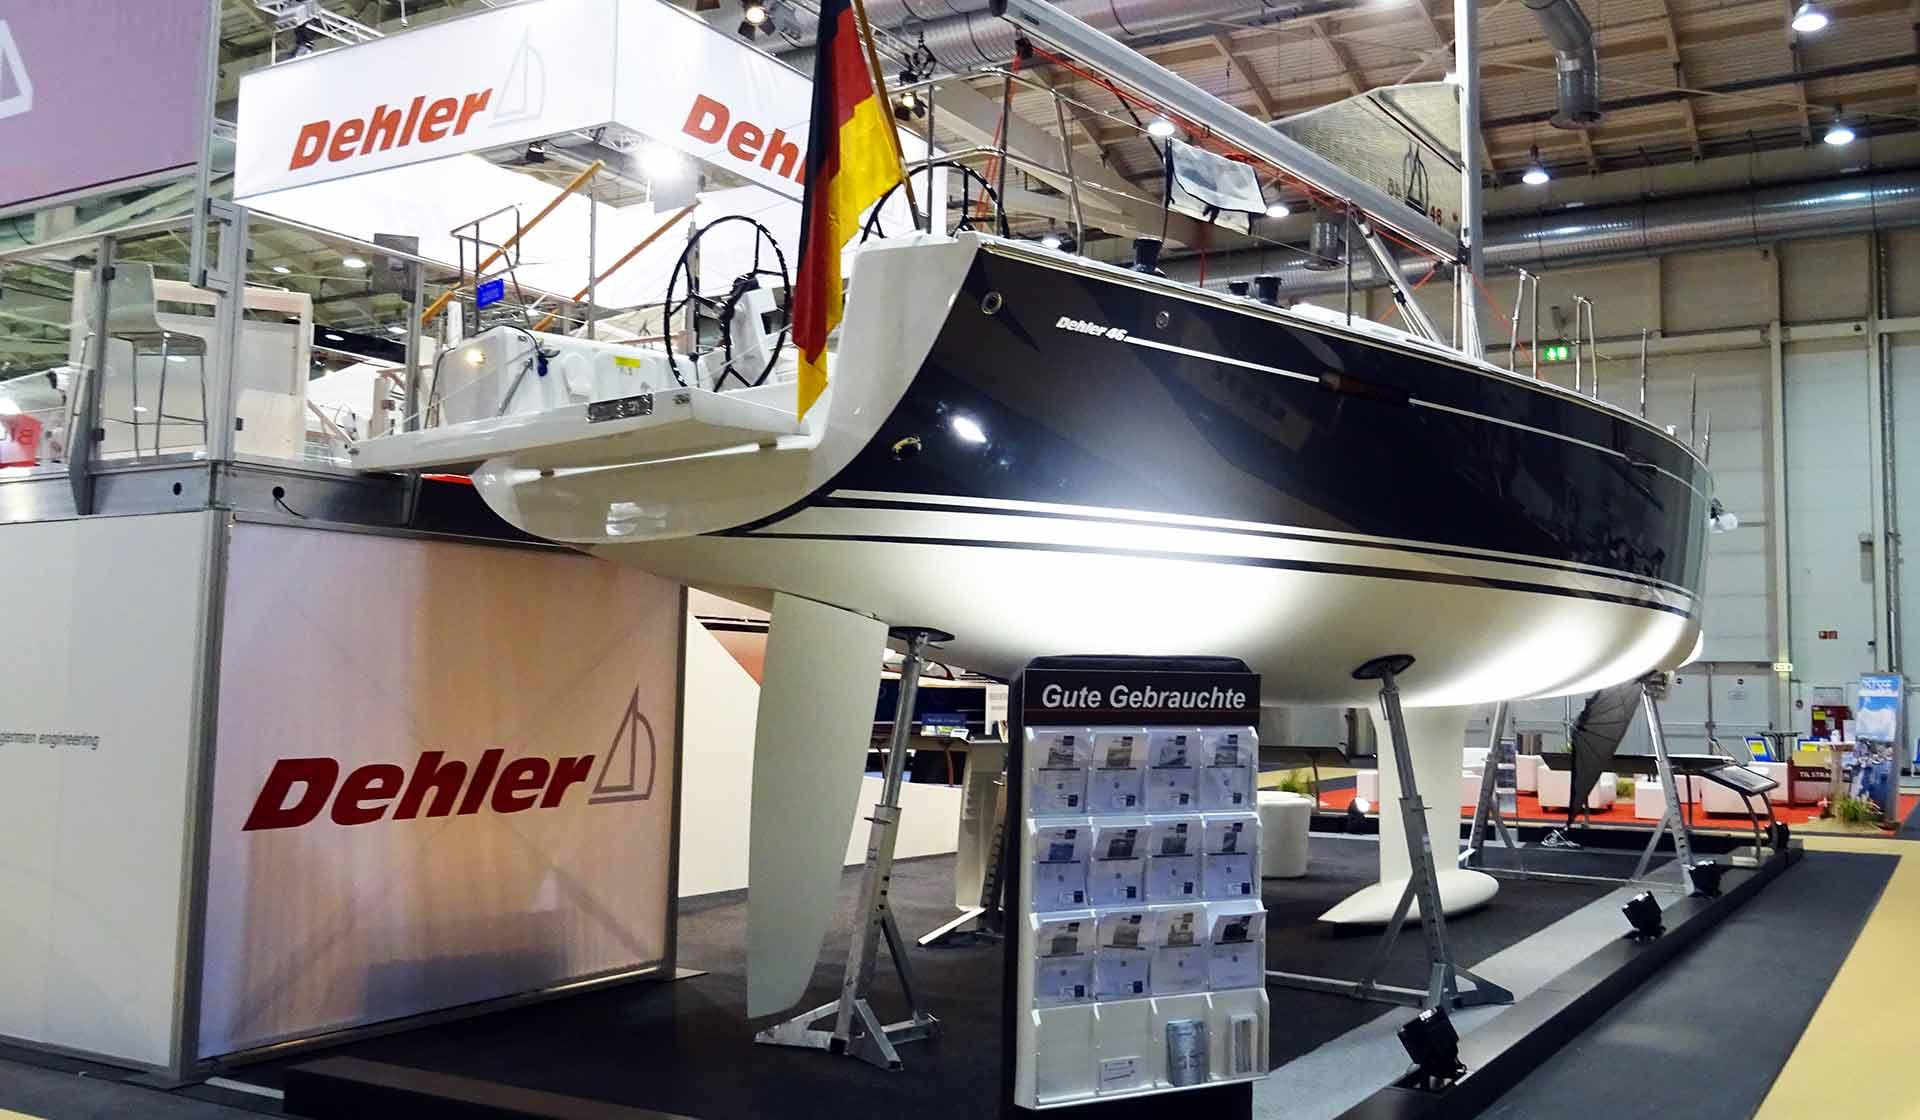 Downside: A rudder as deep as the keel?